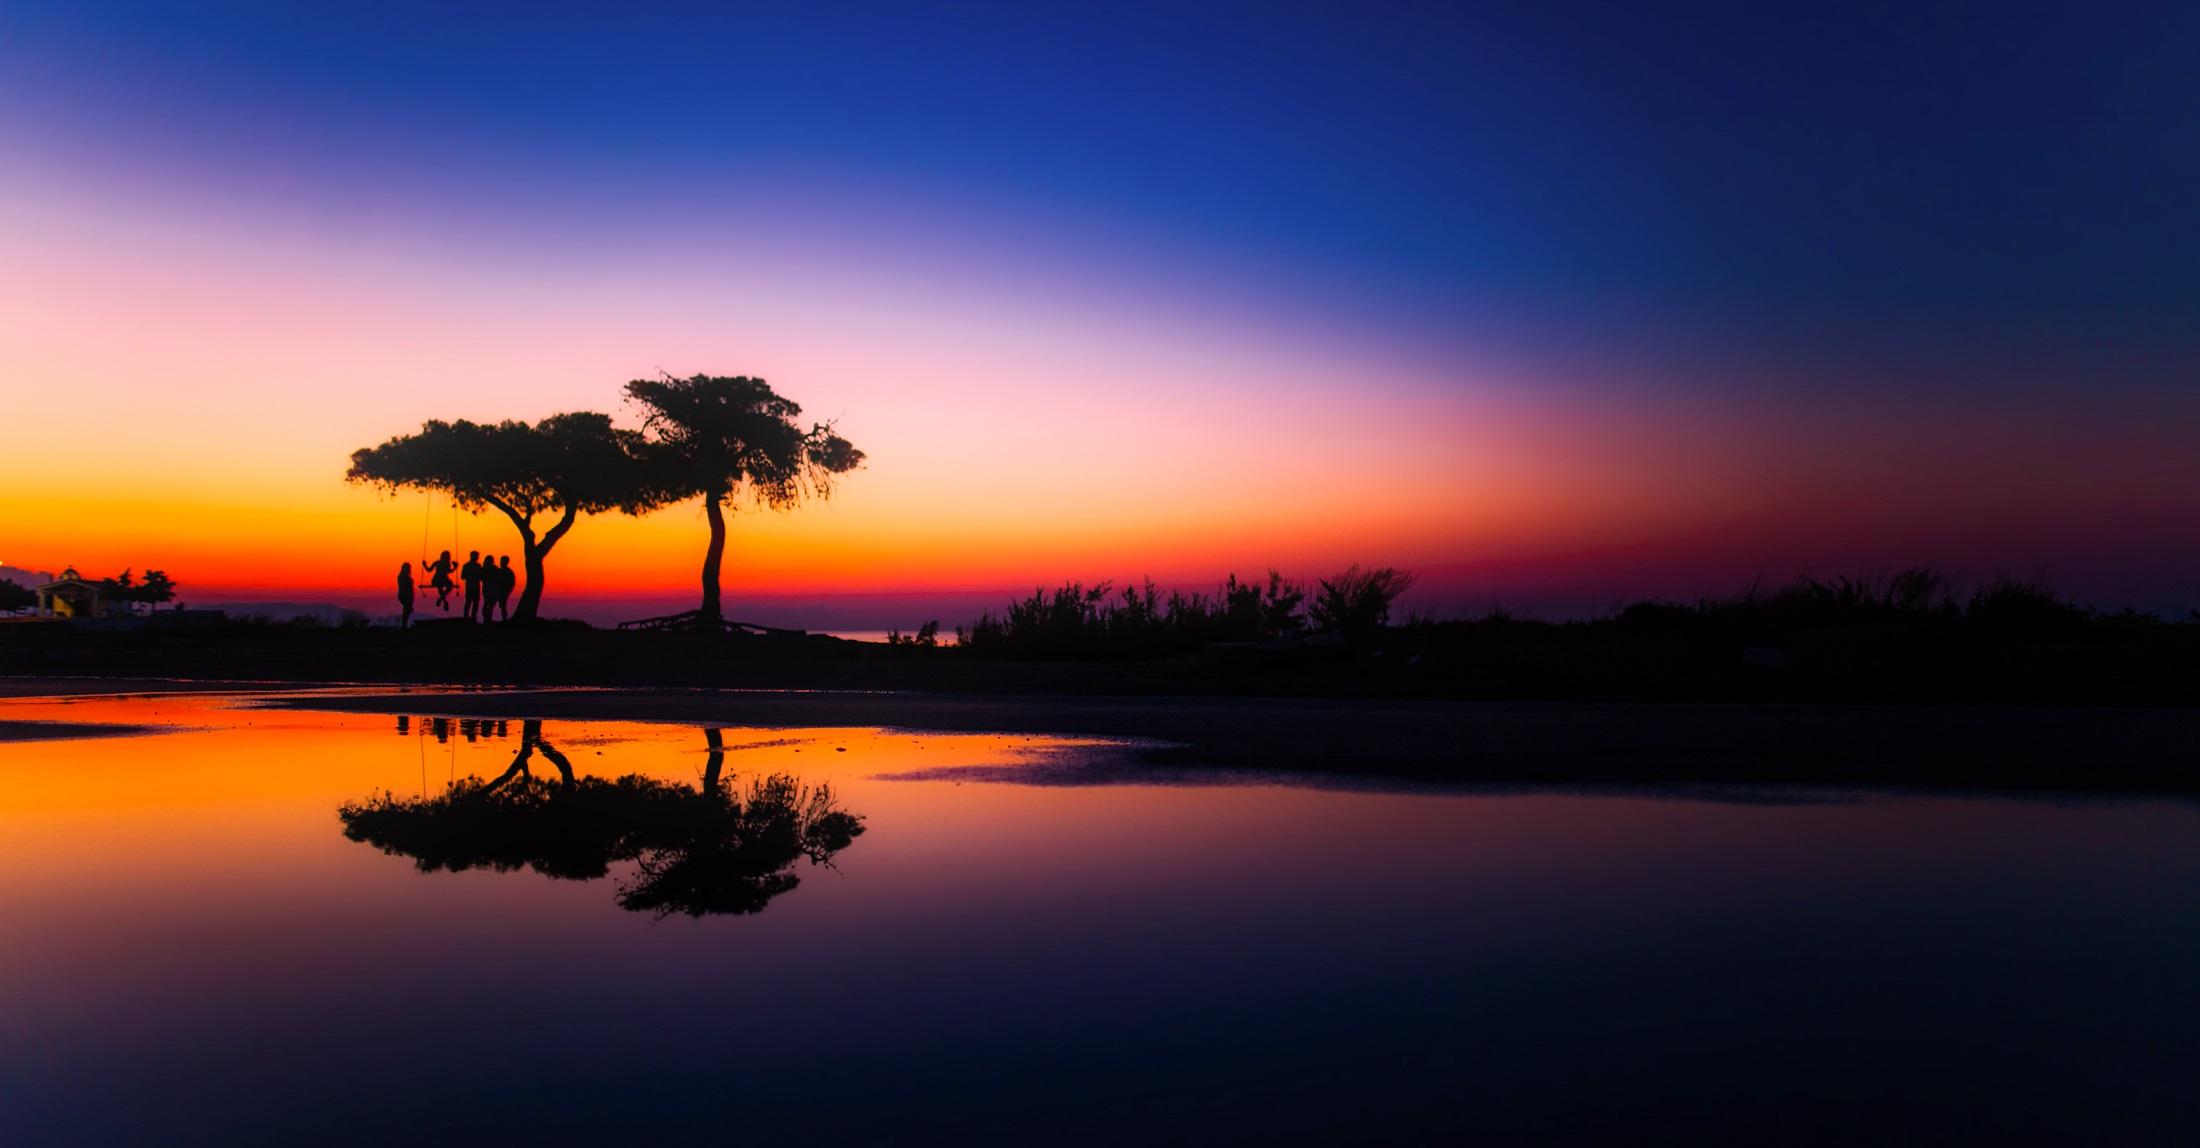 Gambar Pemandangan Air Alam Horison Matahari Terbit